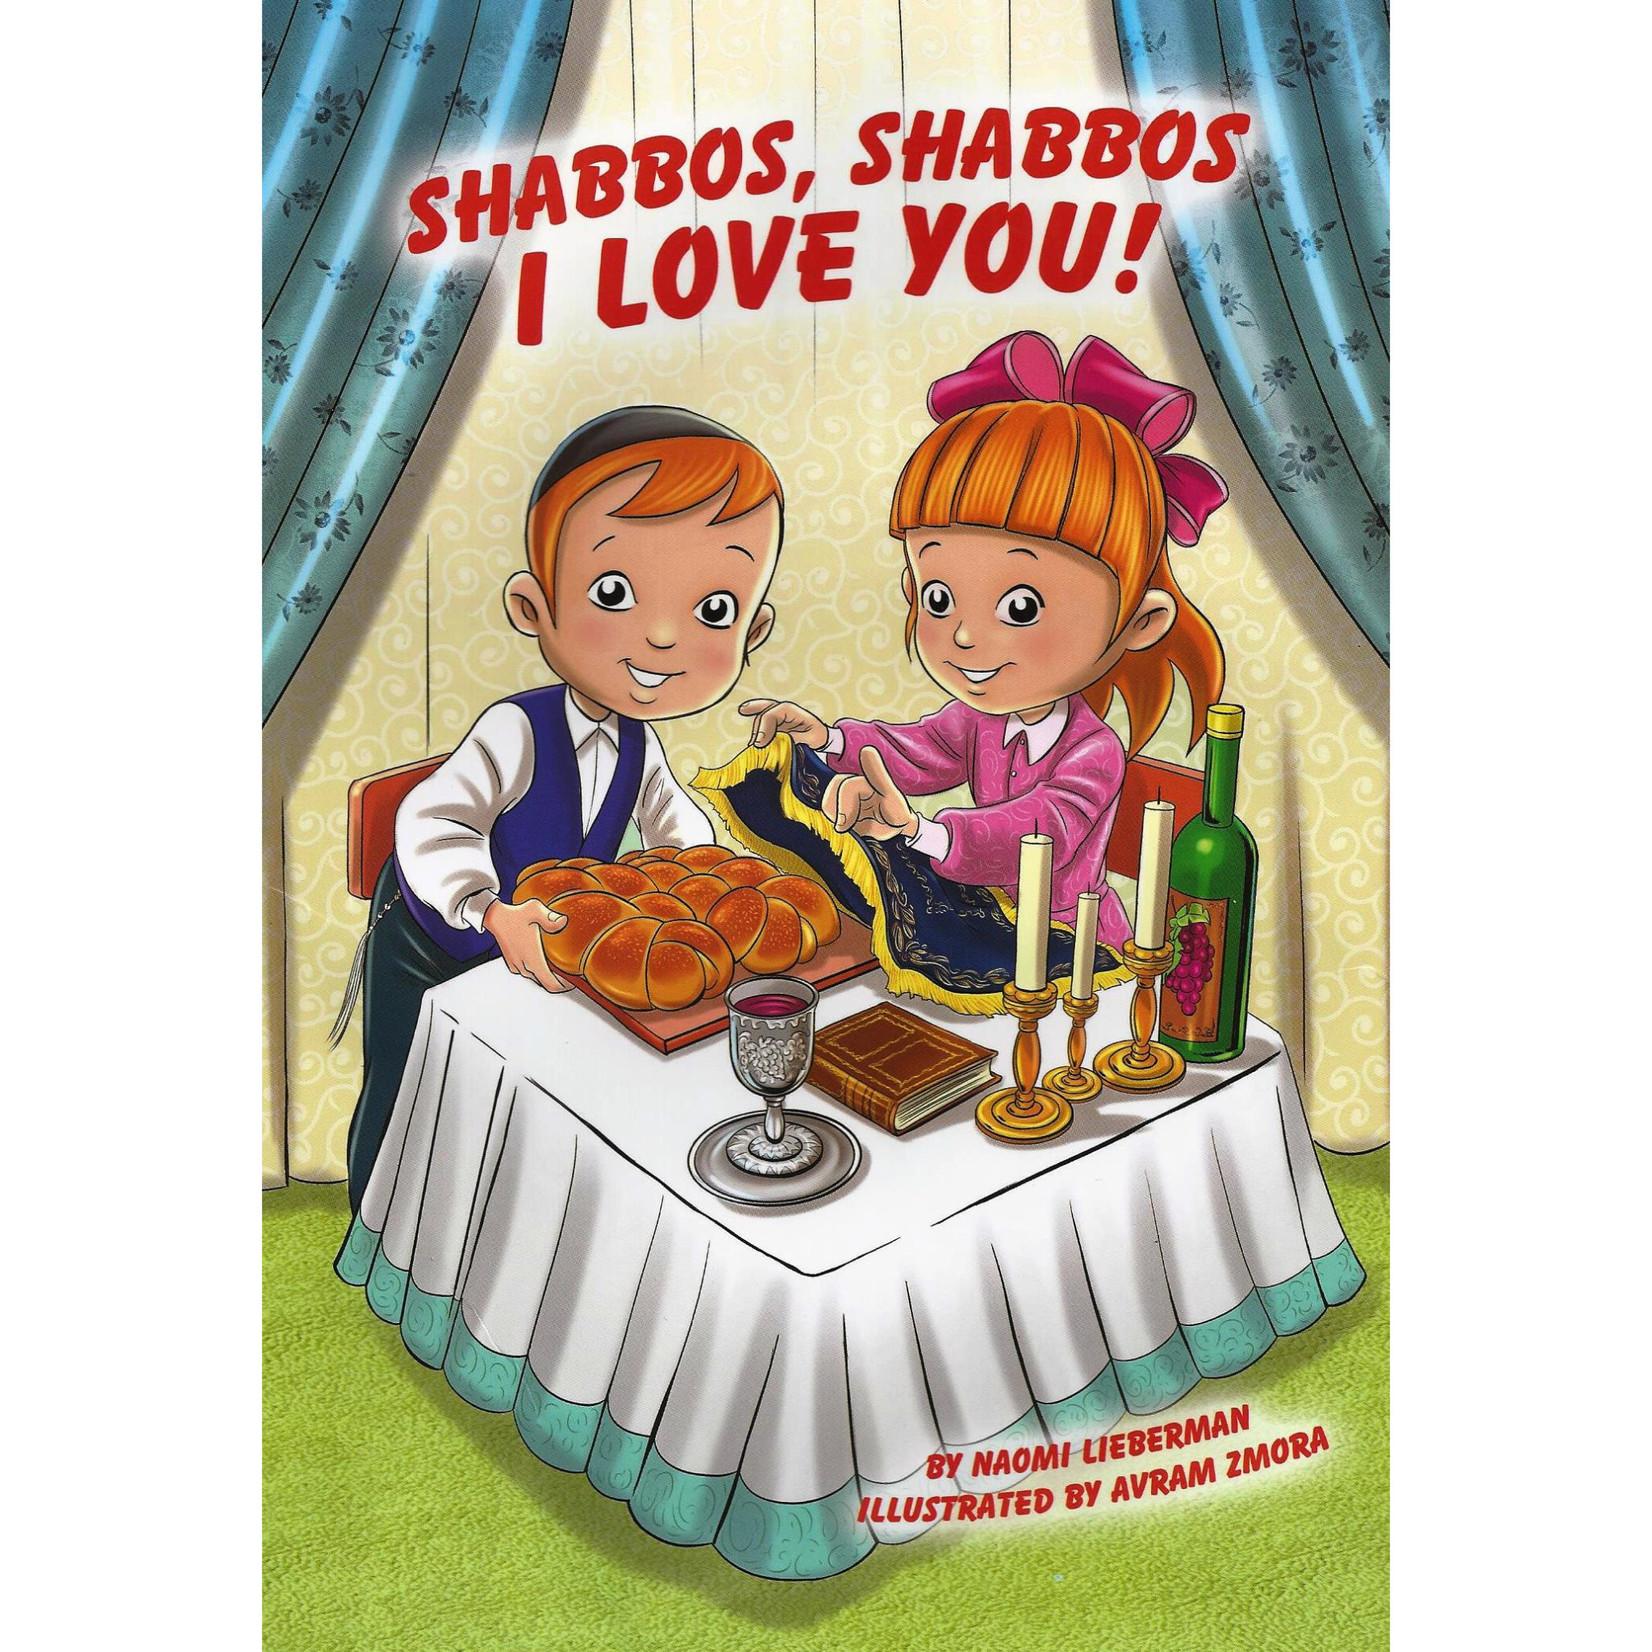 Shabbos Shabbos I Love You